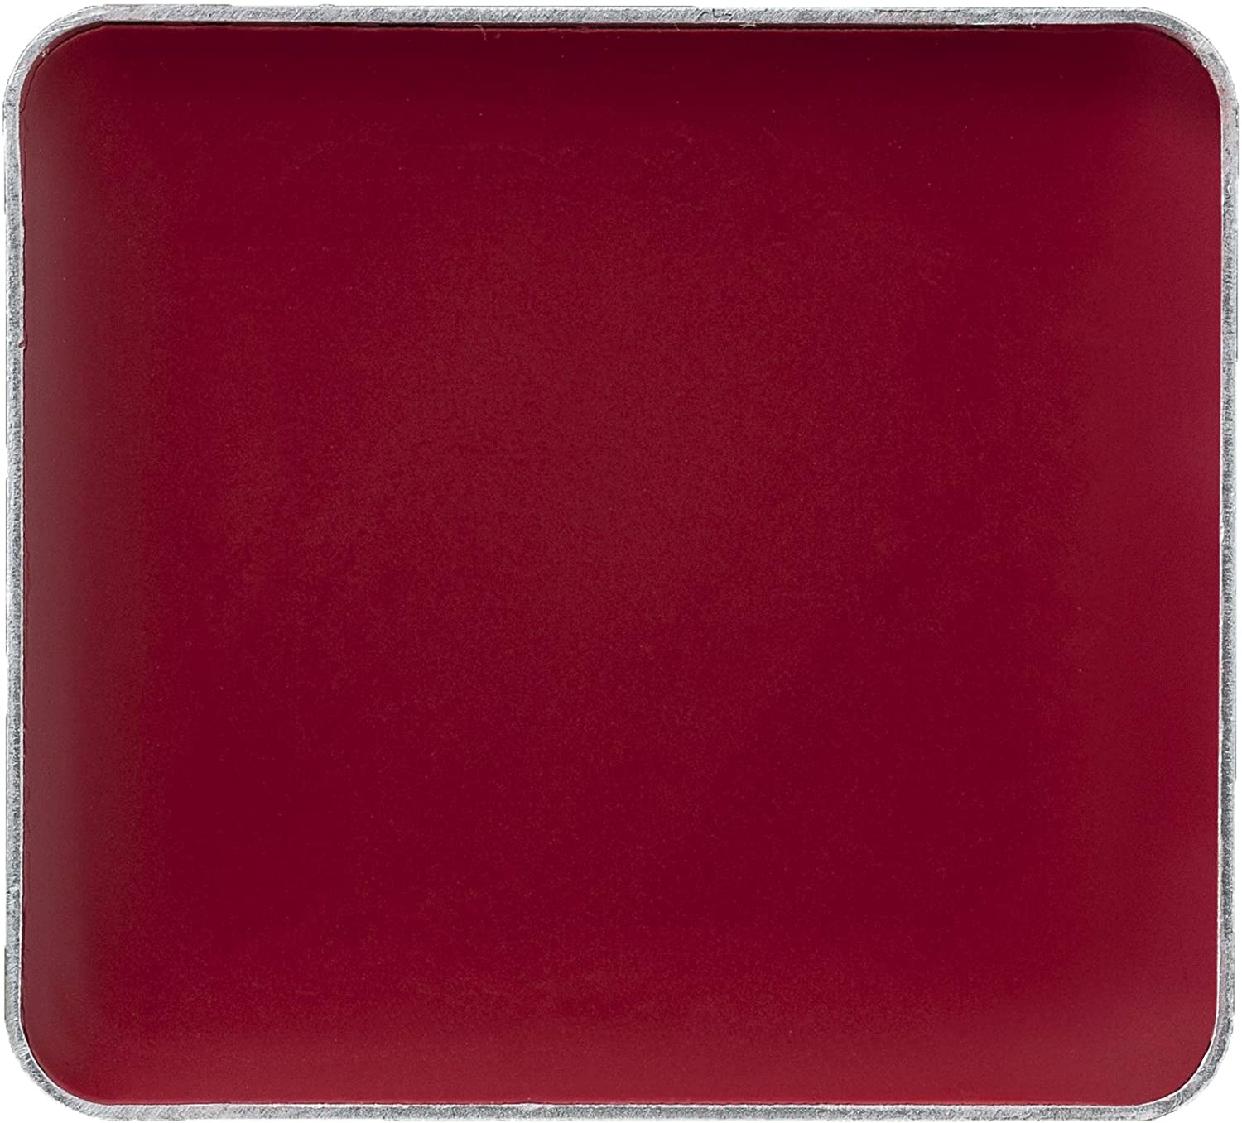 naturaglacé(ナチュラグラッセ)タッチオンカラーズ (カラー)の商品画像2